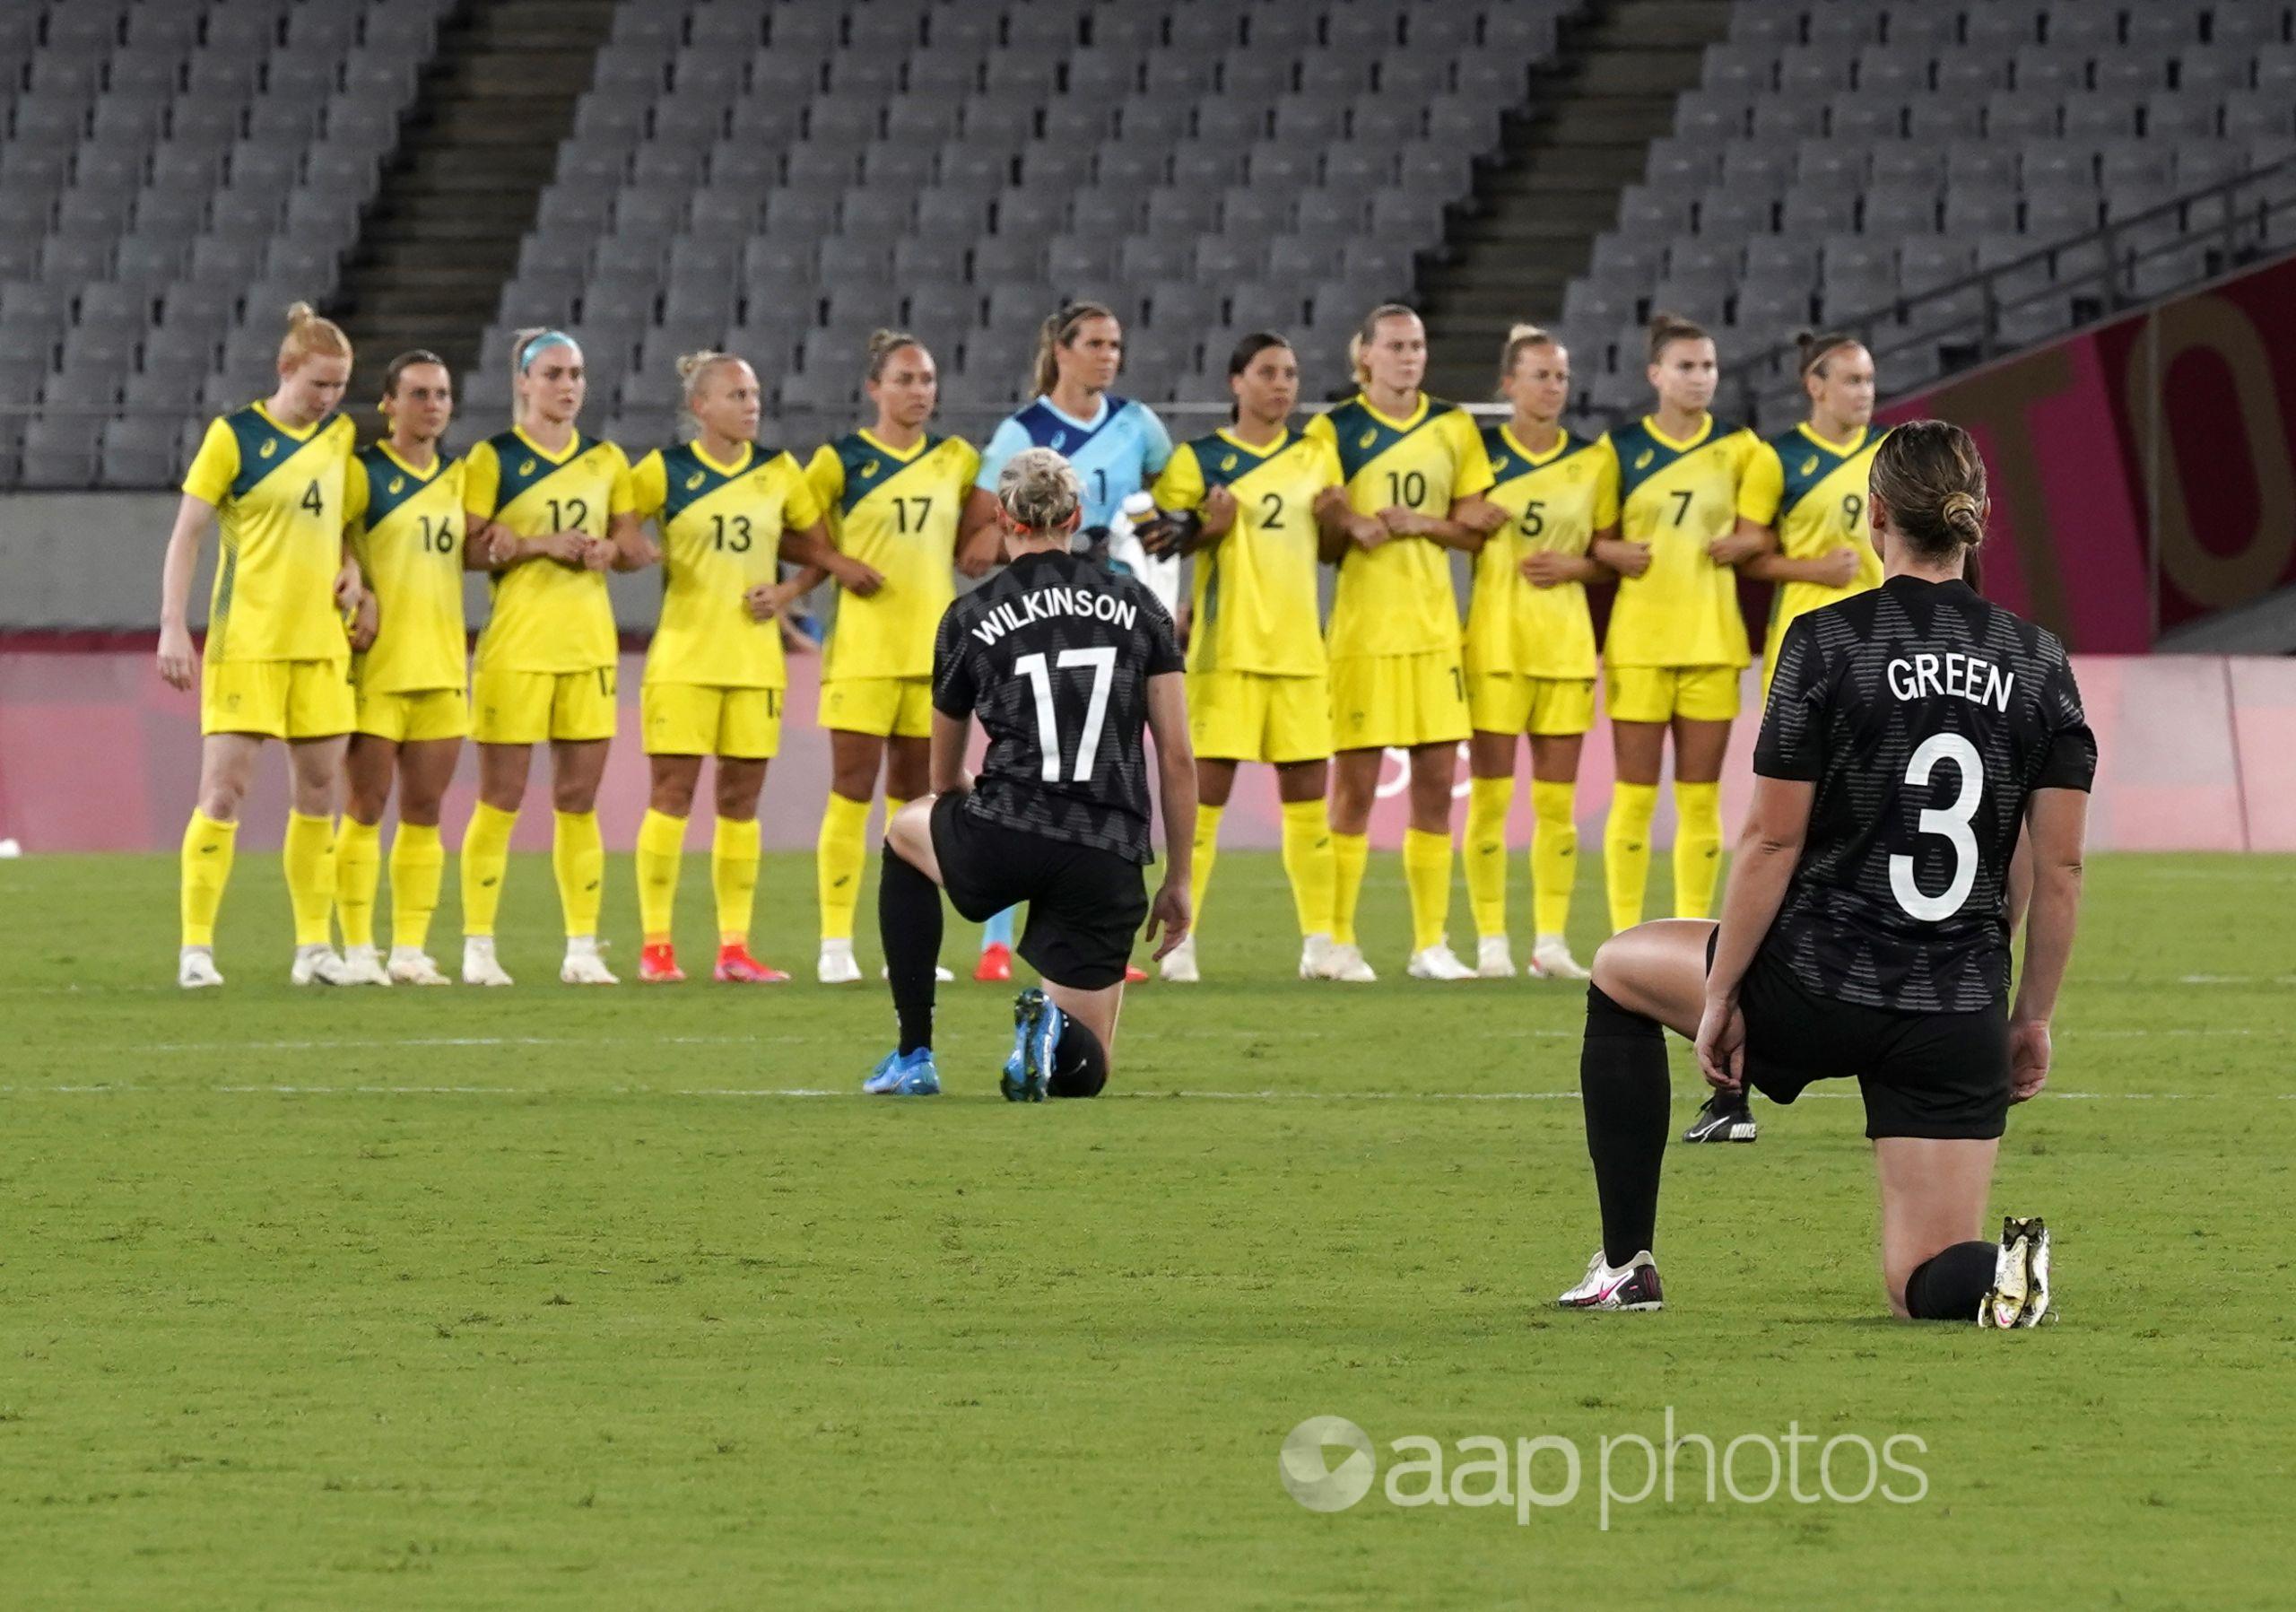 NZ players kneel before the women's soccer match against Australia.